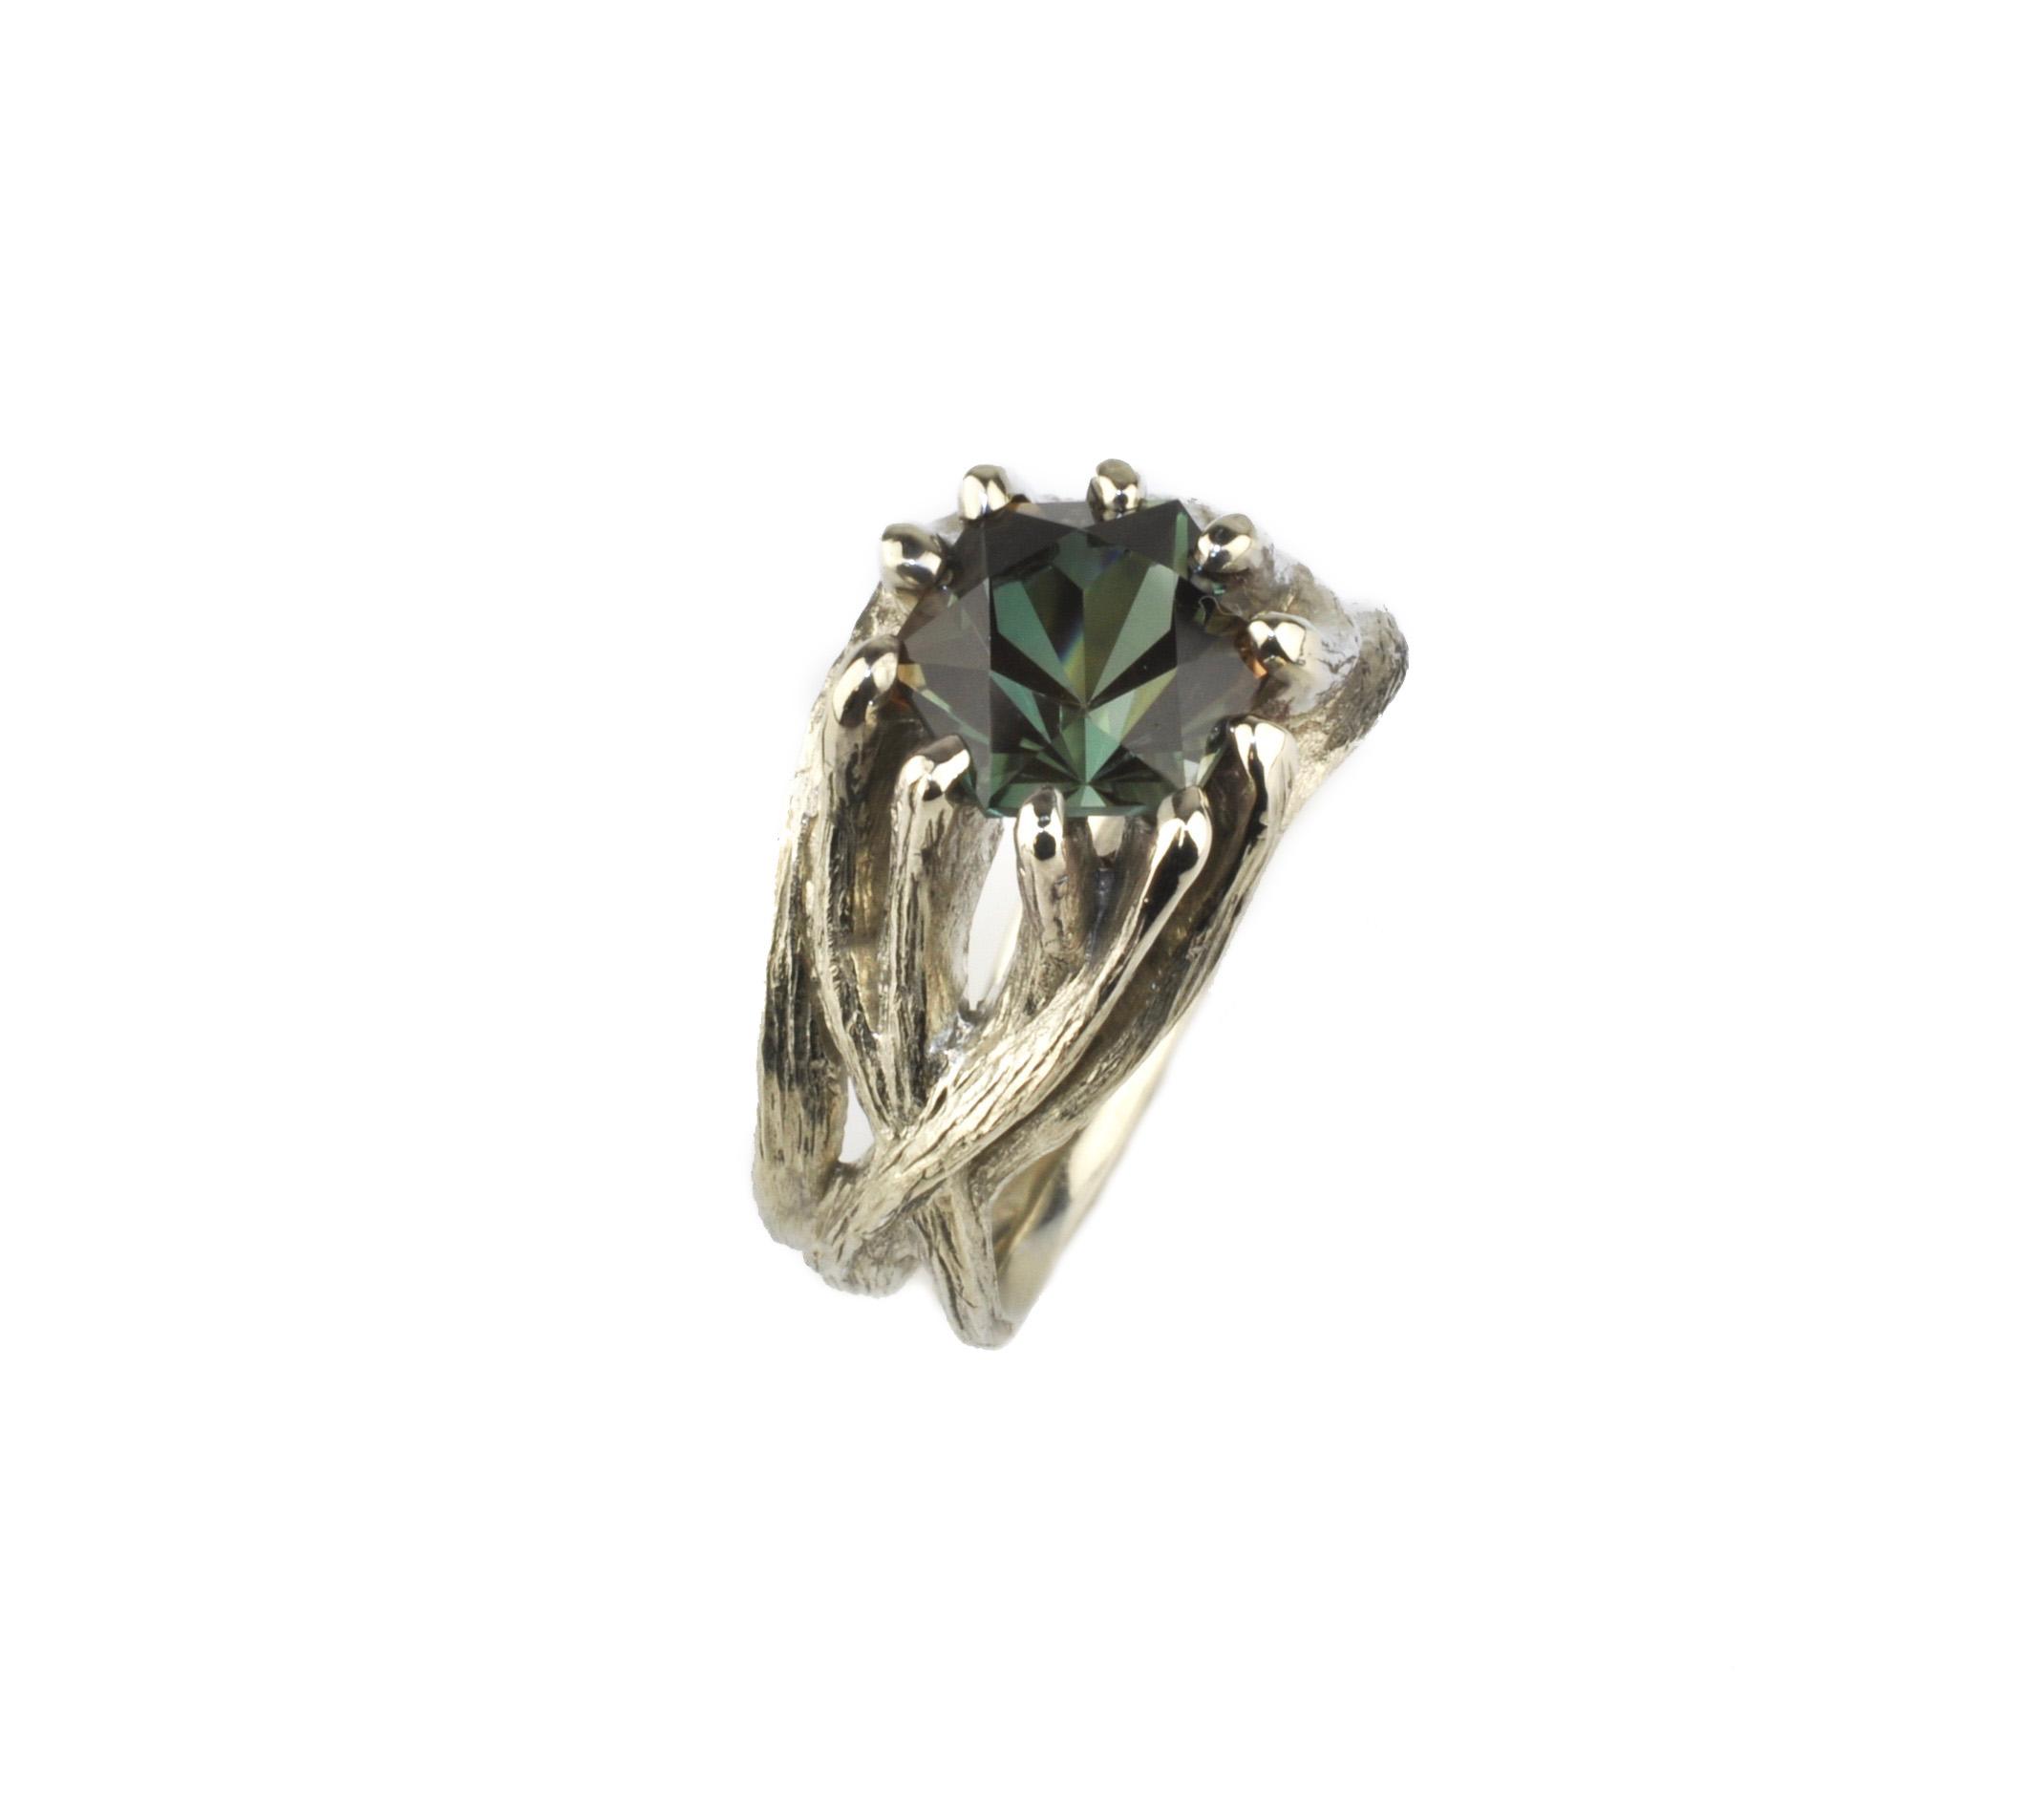 Waylon Rhoads Original 14k White Gold Tree Ring with Oregon Sunstone